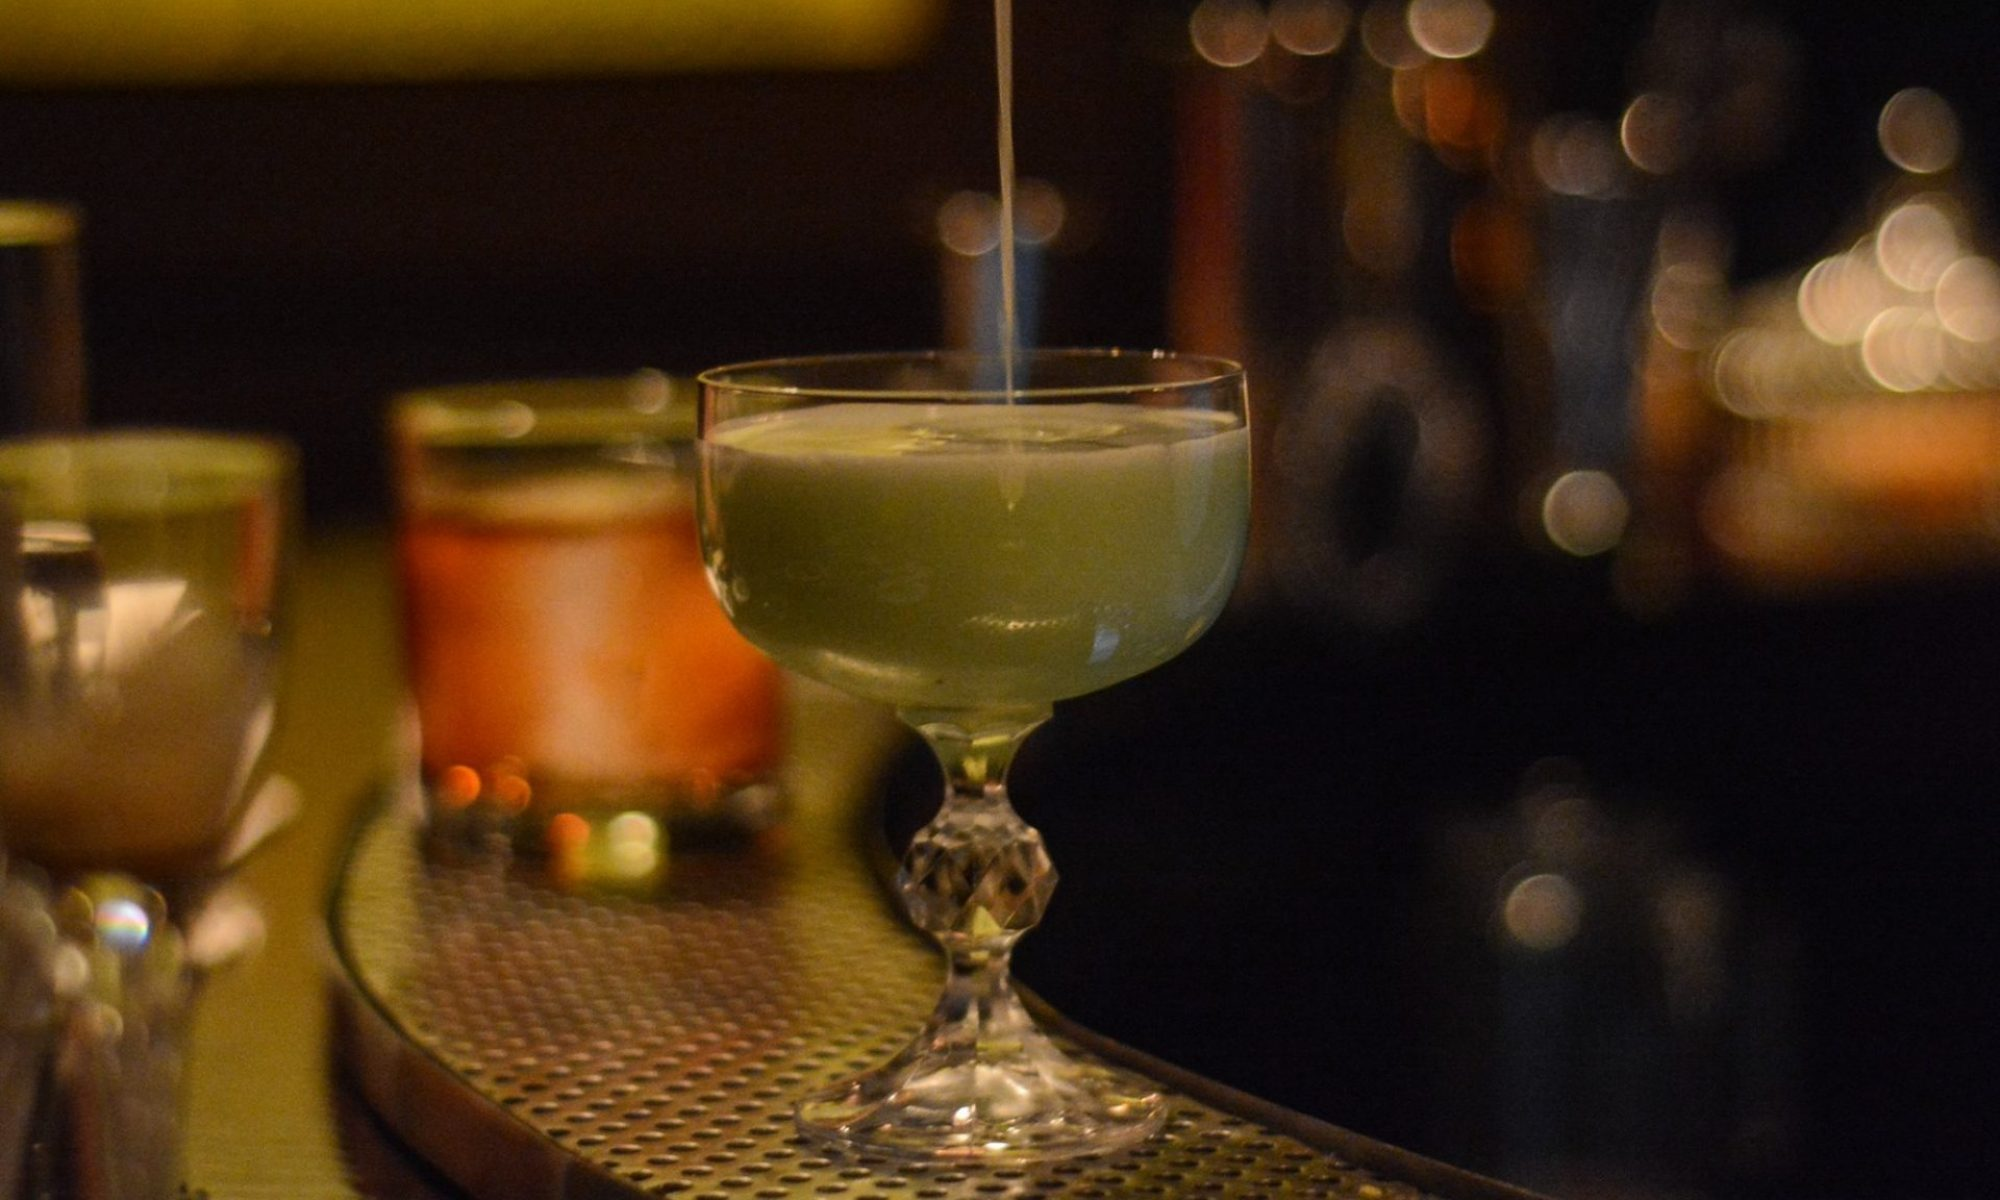 The Bar To Rang All Other Bars - Bar Reviews